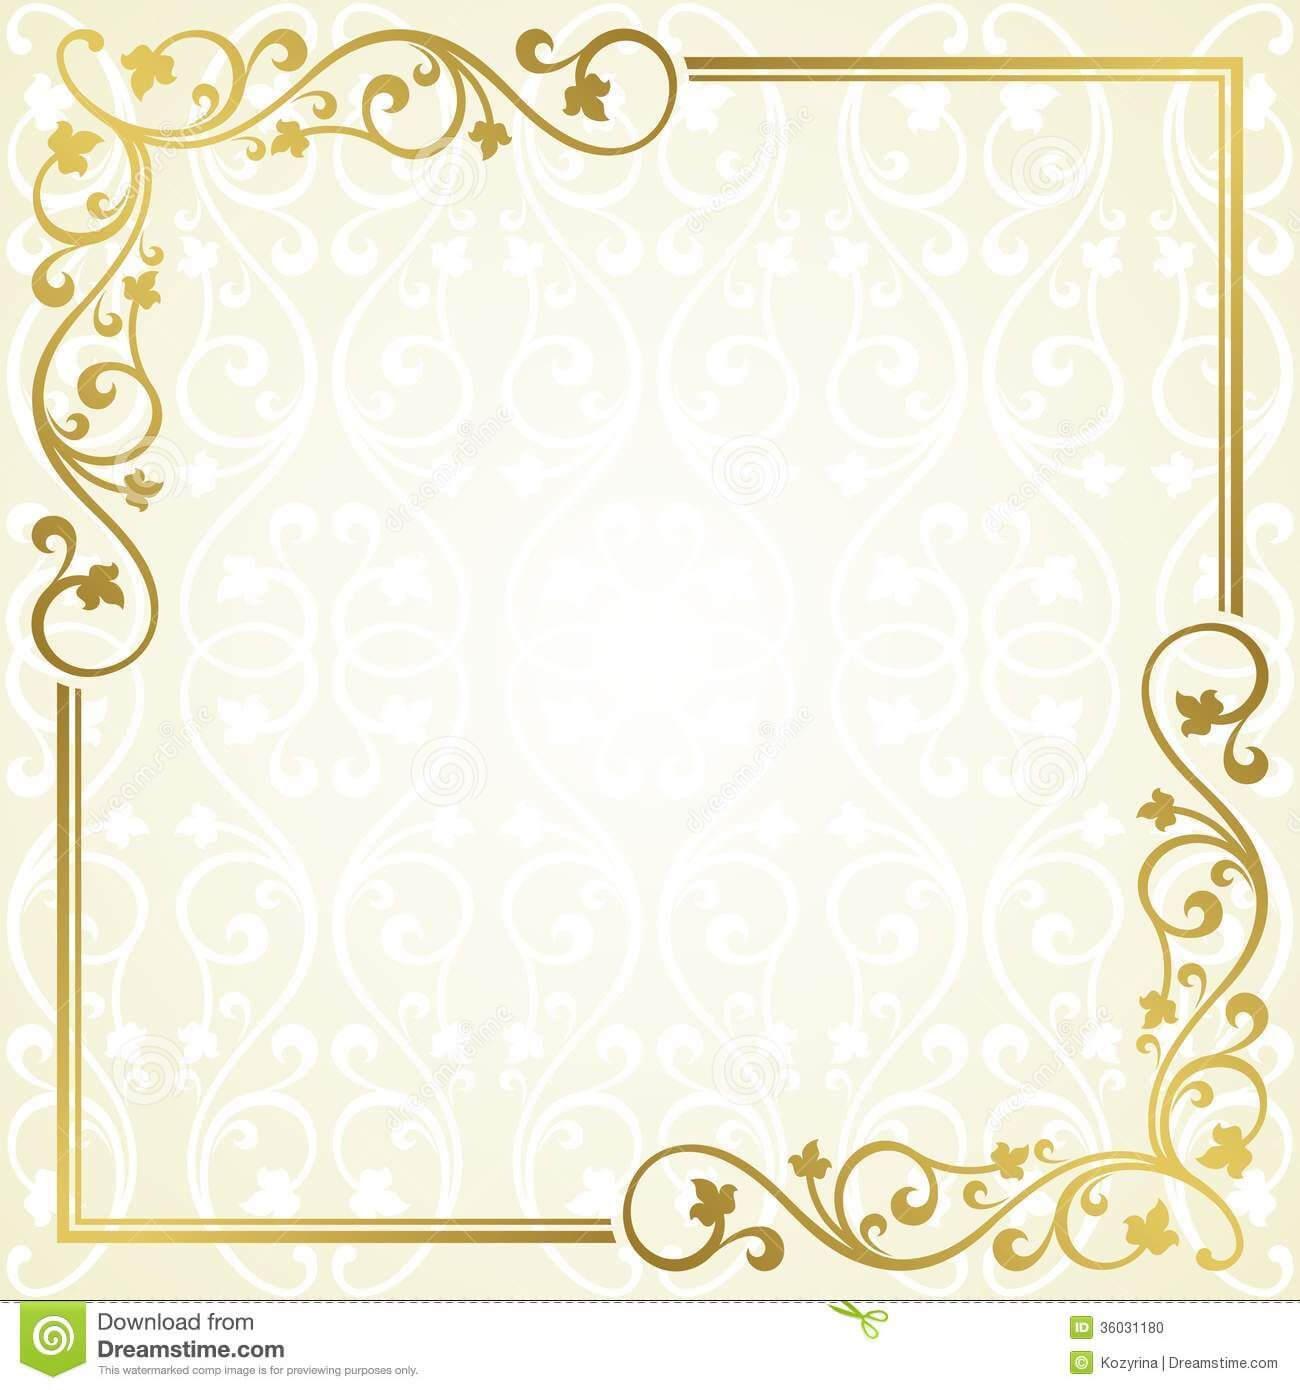 Invitations Cards Templates | Free Invitation Cards Inside Blank Templates For Invitations